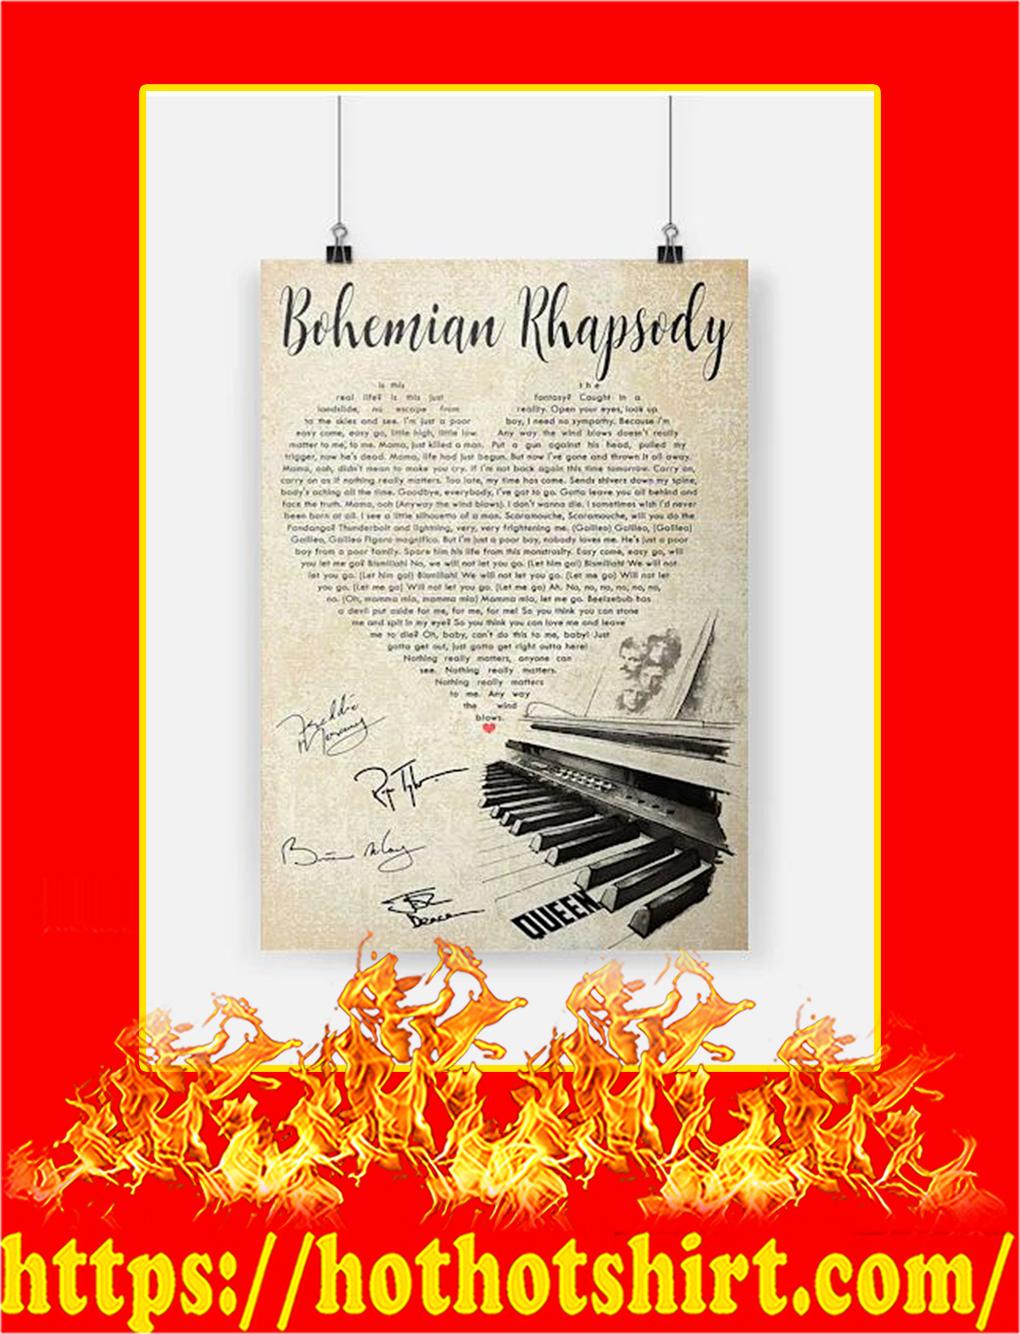 Bohemian Rhapsody Queen Heart Poster - A4